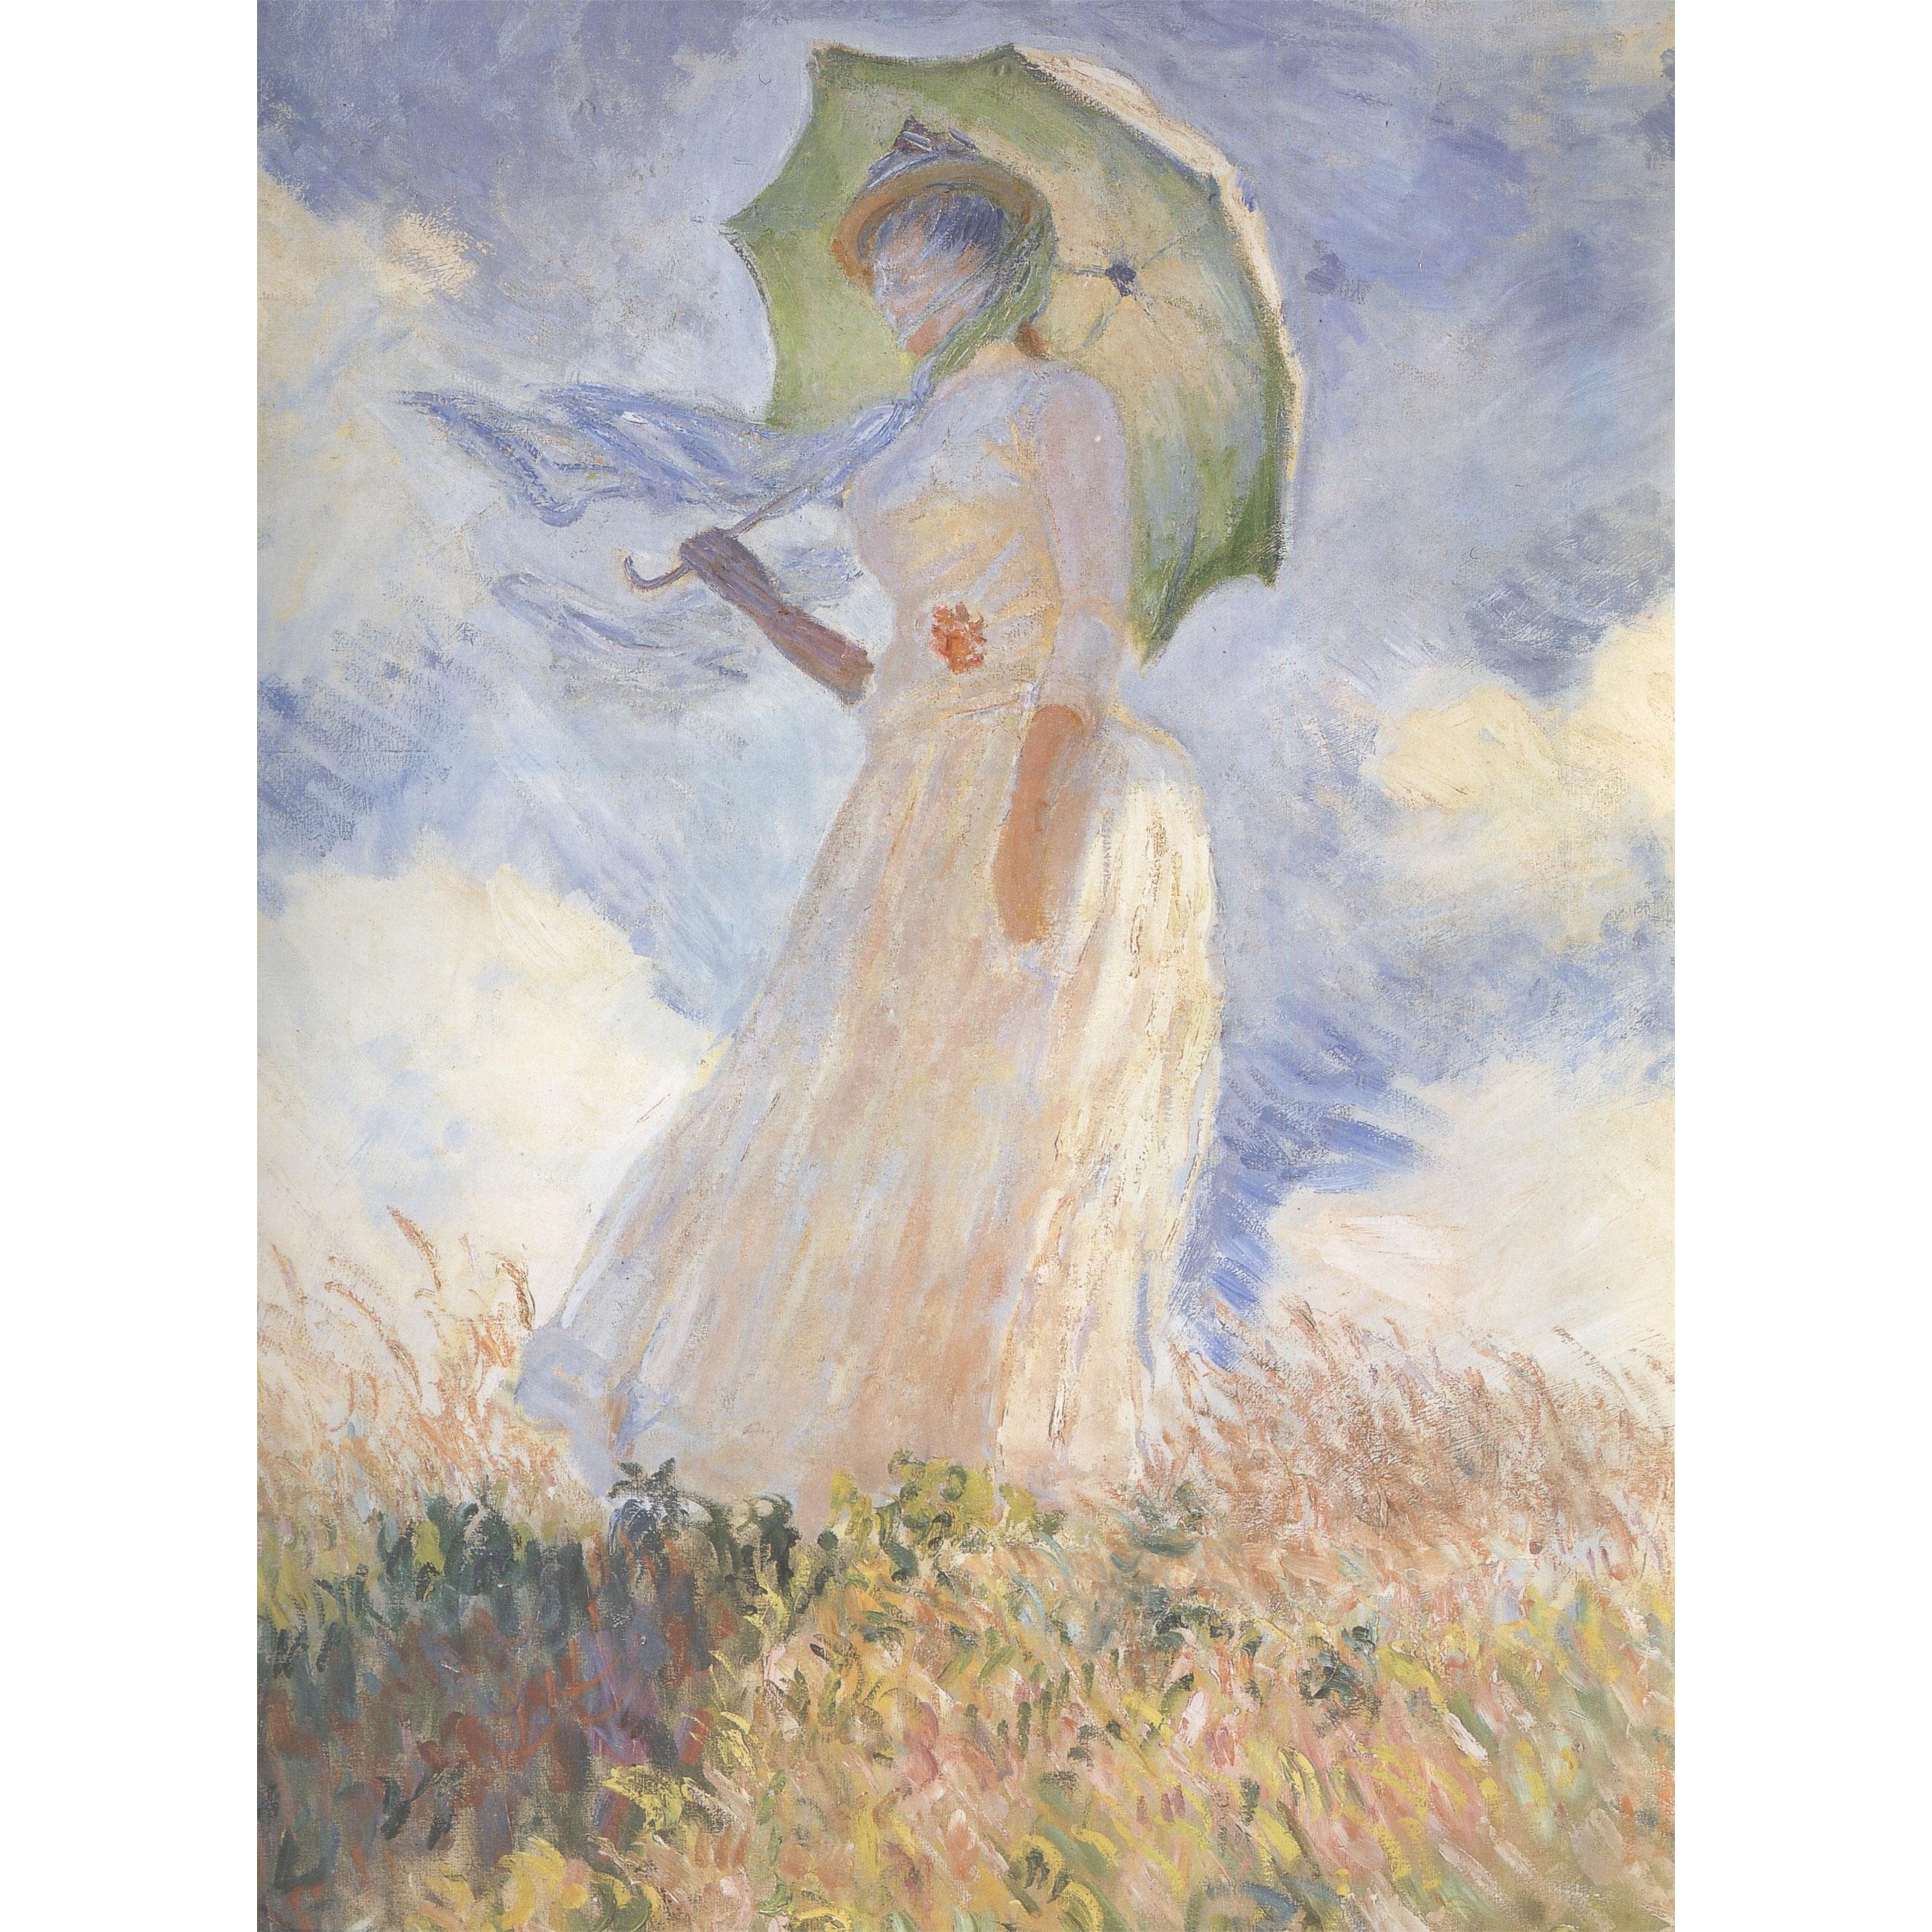 File:Claude Monet 023.jpg - Wikipedia